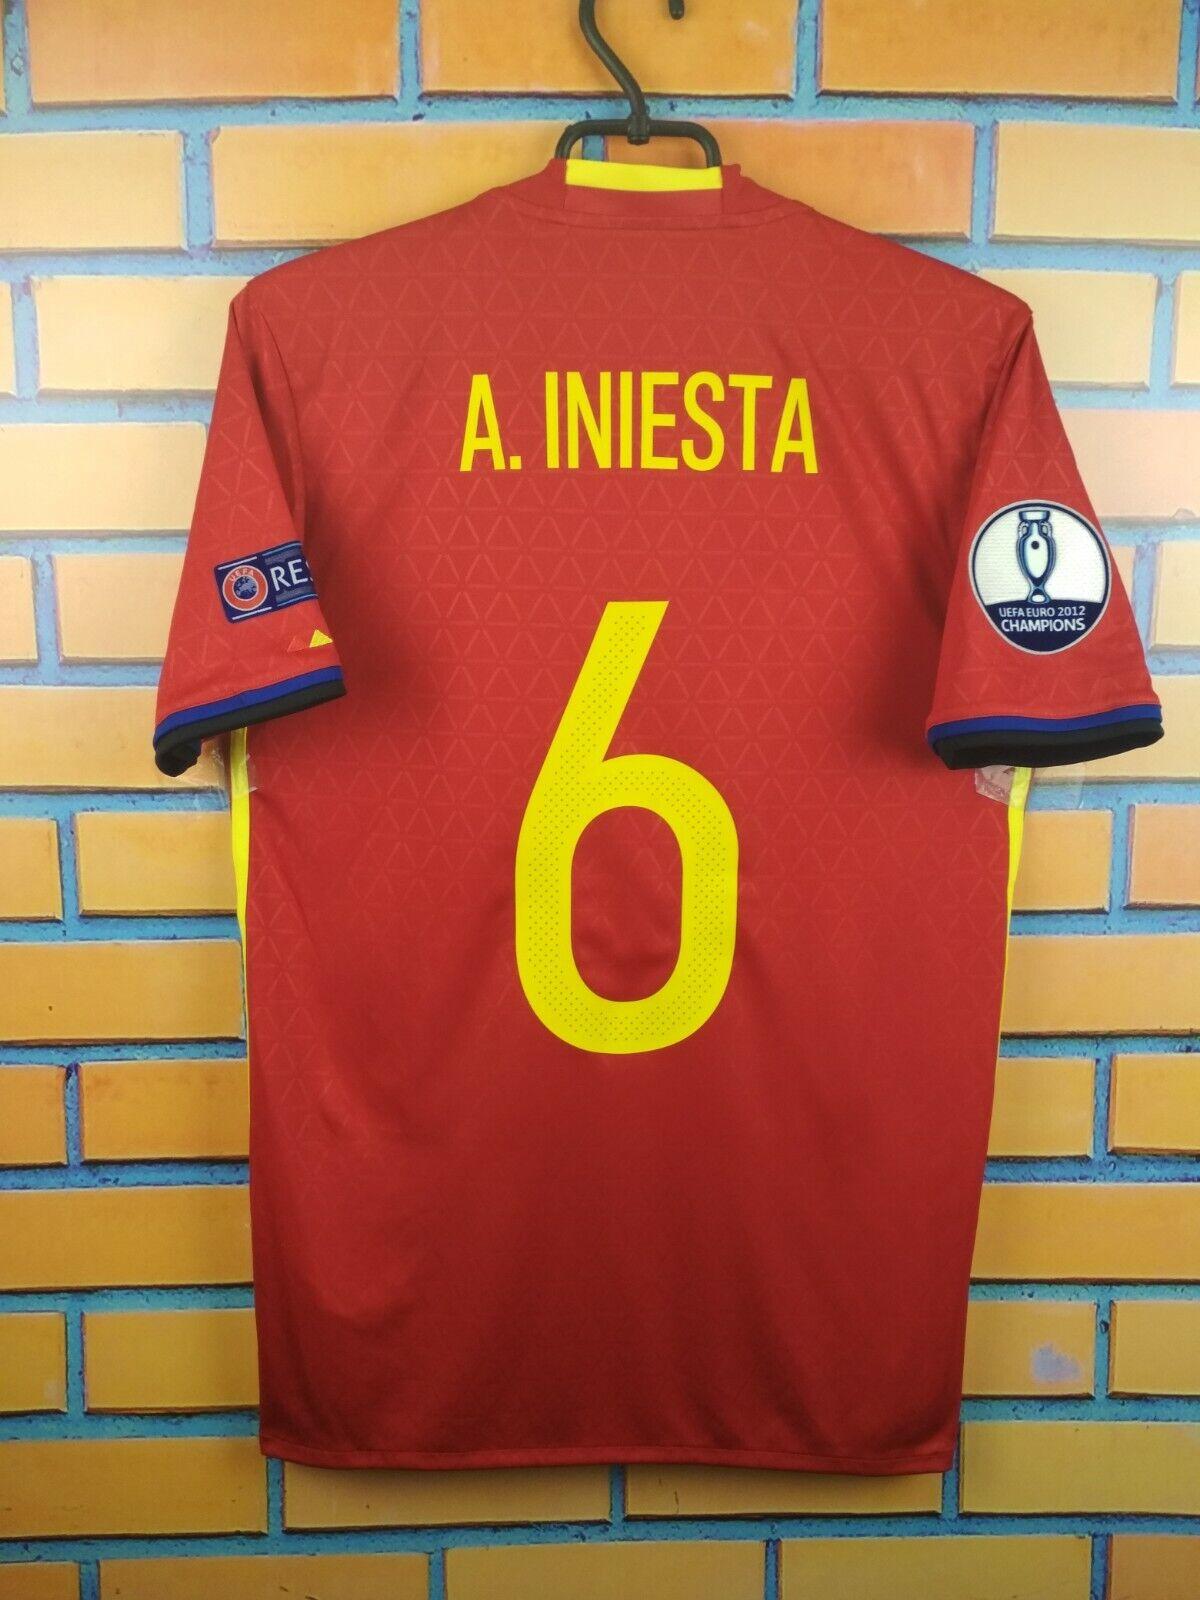 Iniesta Spain soccer jersey smtutti 2016 2017 home shirt AI4411 footbtutti Adidas